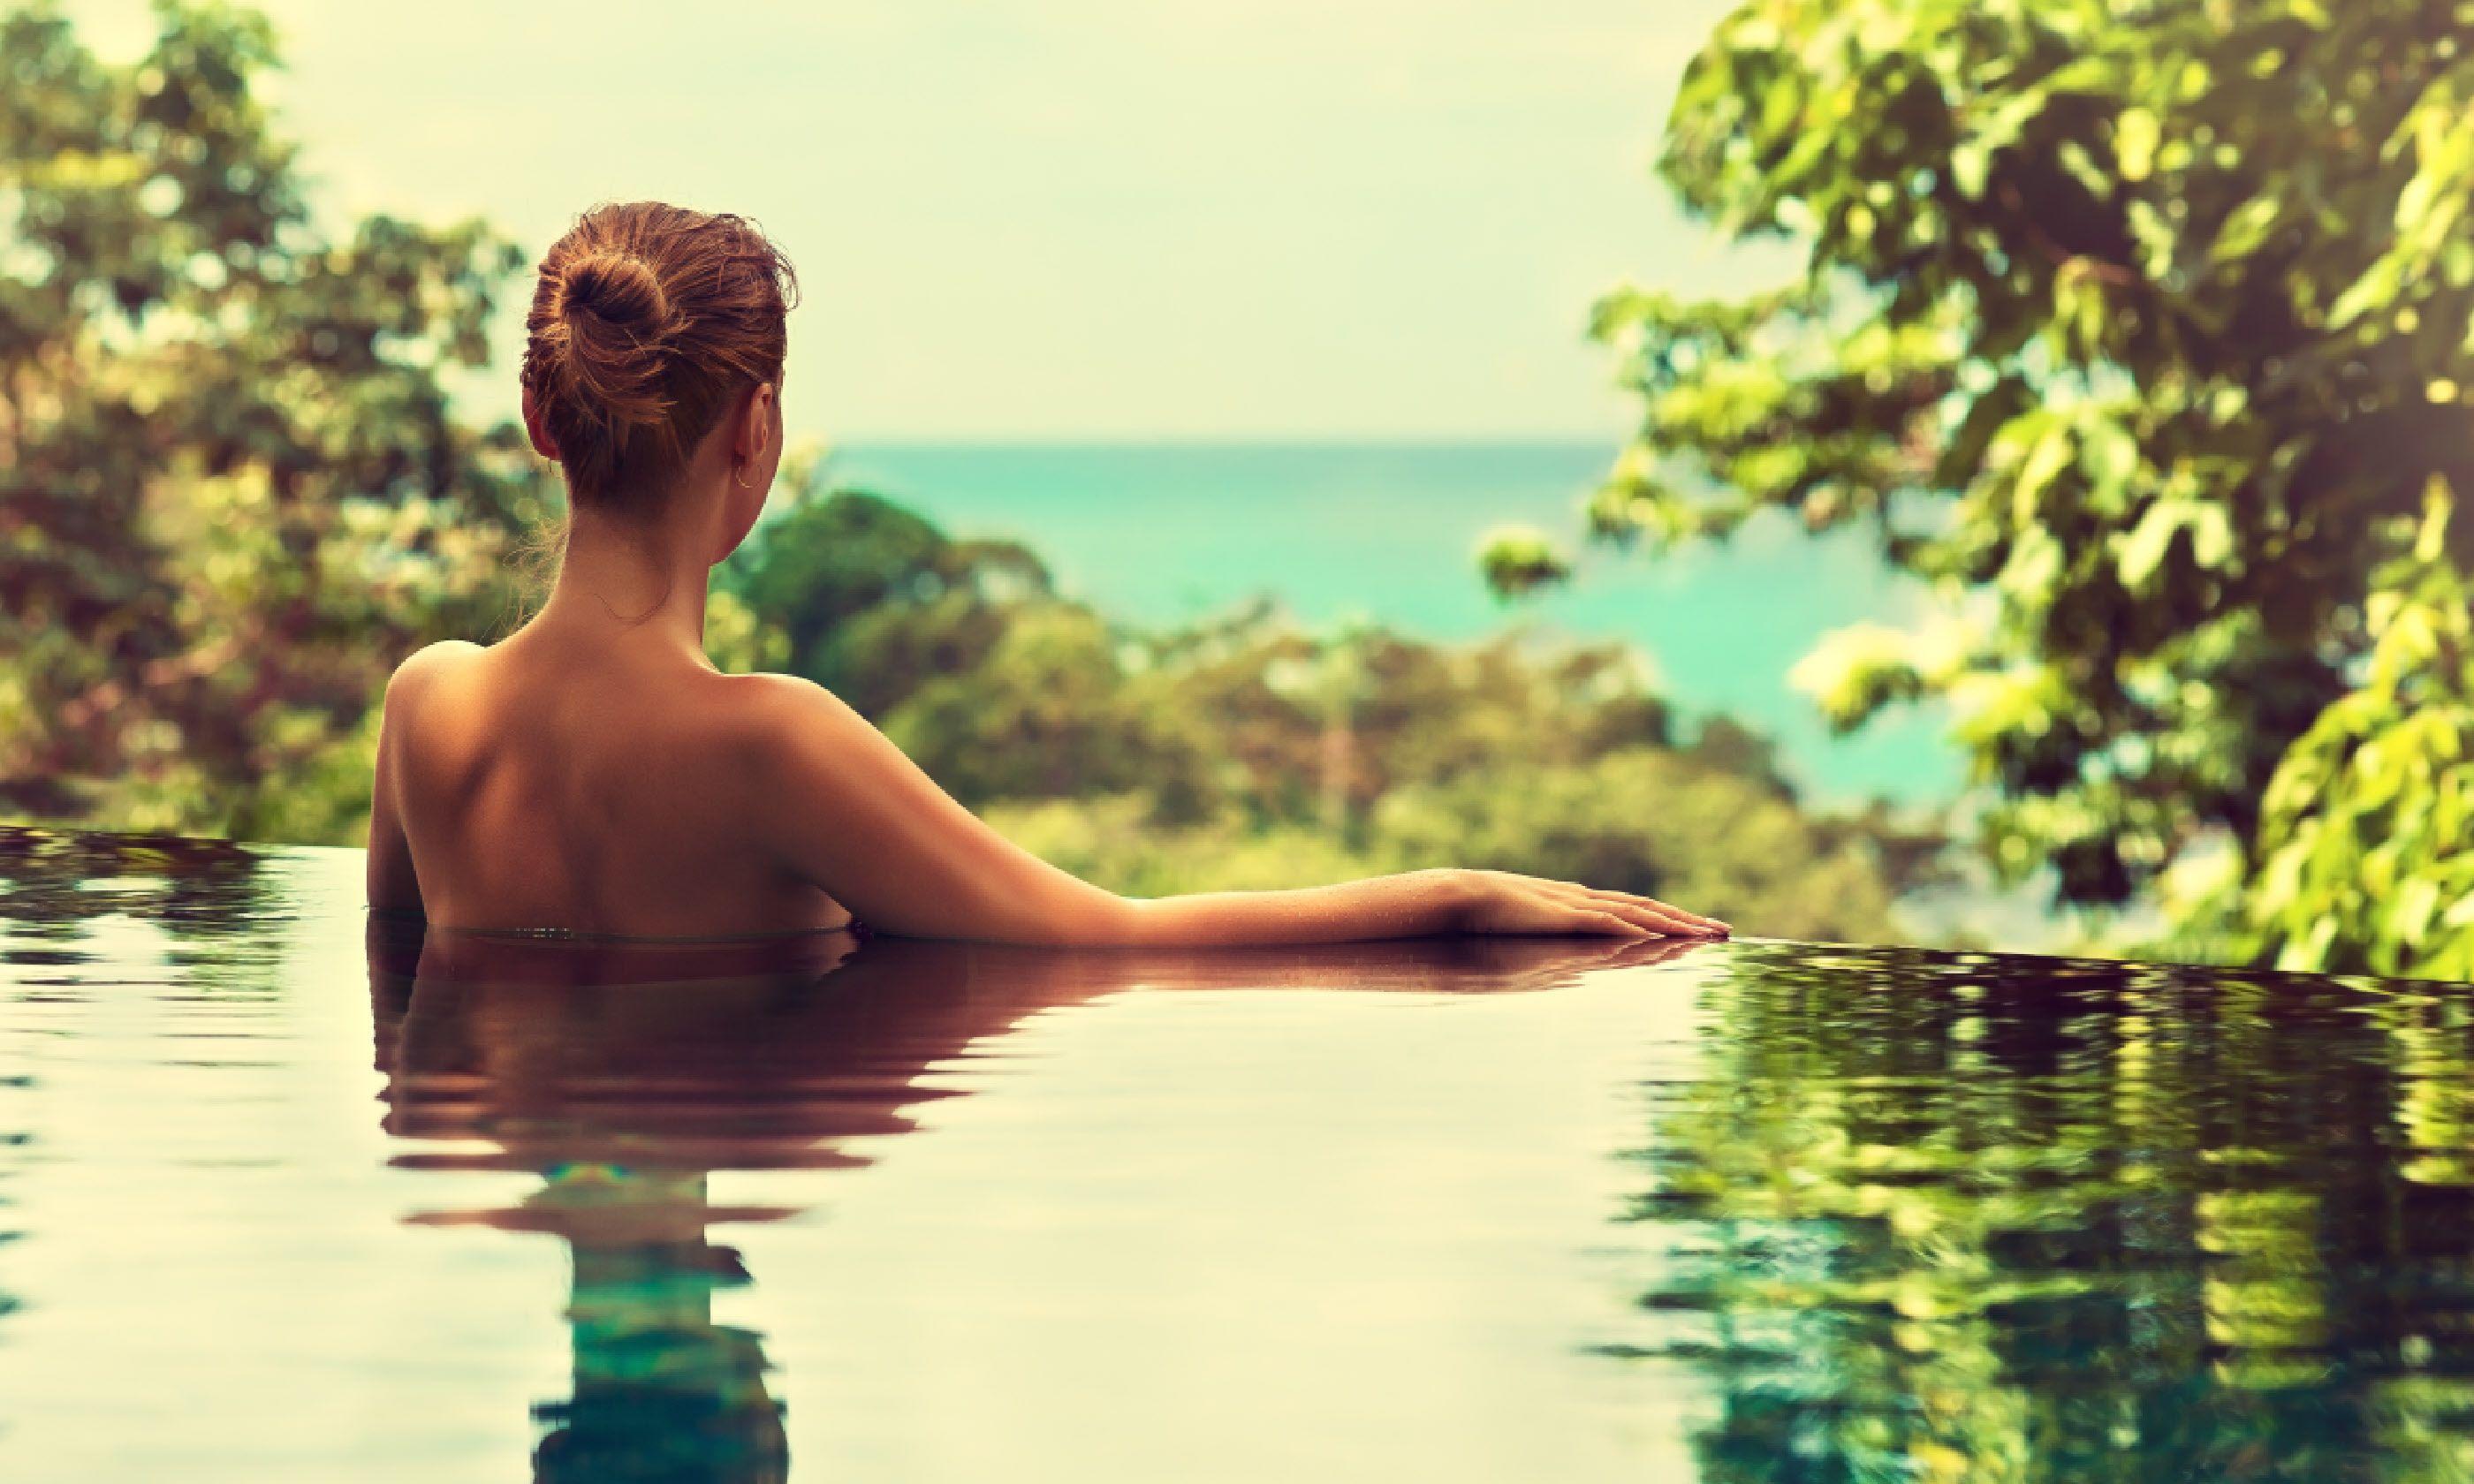 Sunbathing and spa treatments, Bali (Shutterstock)